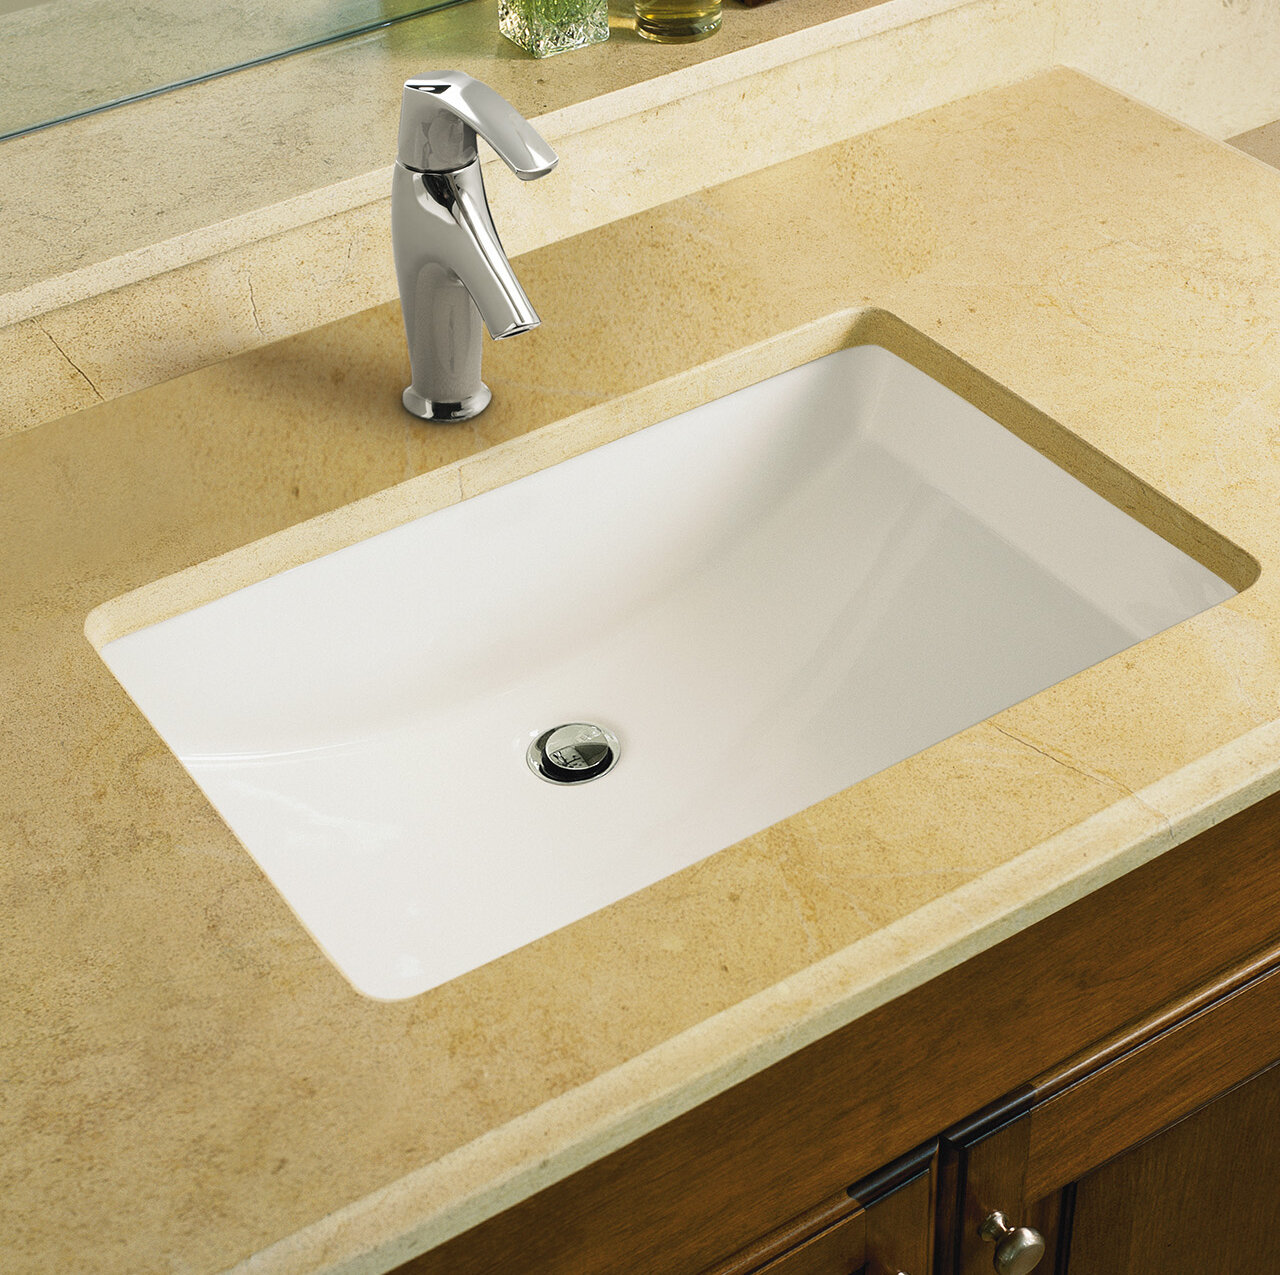 K-2215-0,96,95 Kohler Ladena Ceramic Rectangular Undermount Bathroom Sink with Overflow & Reviews | Wayfair